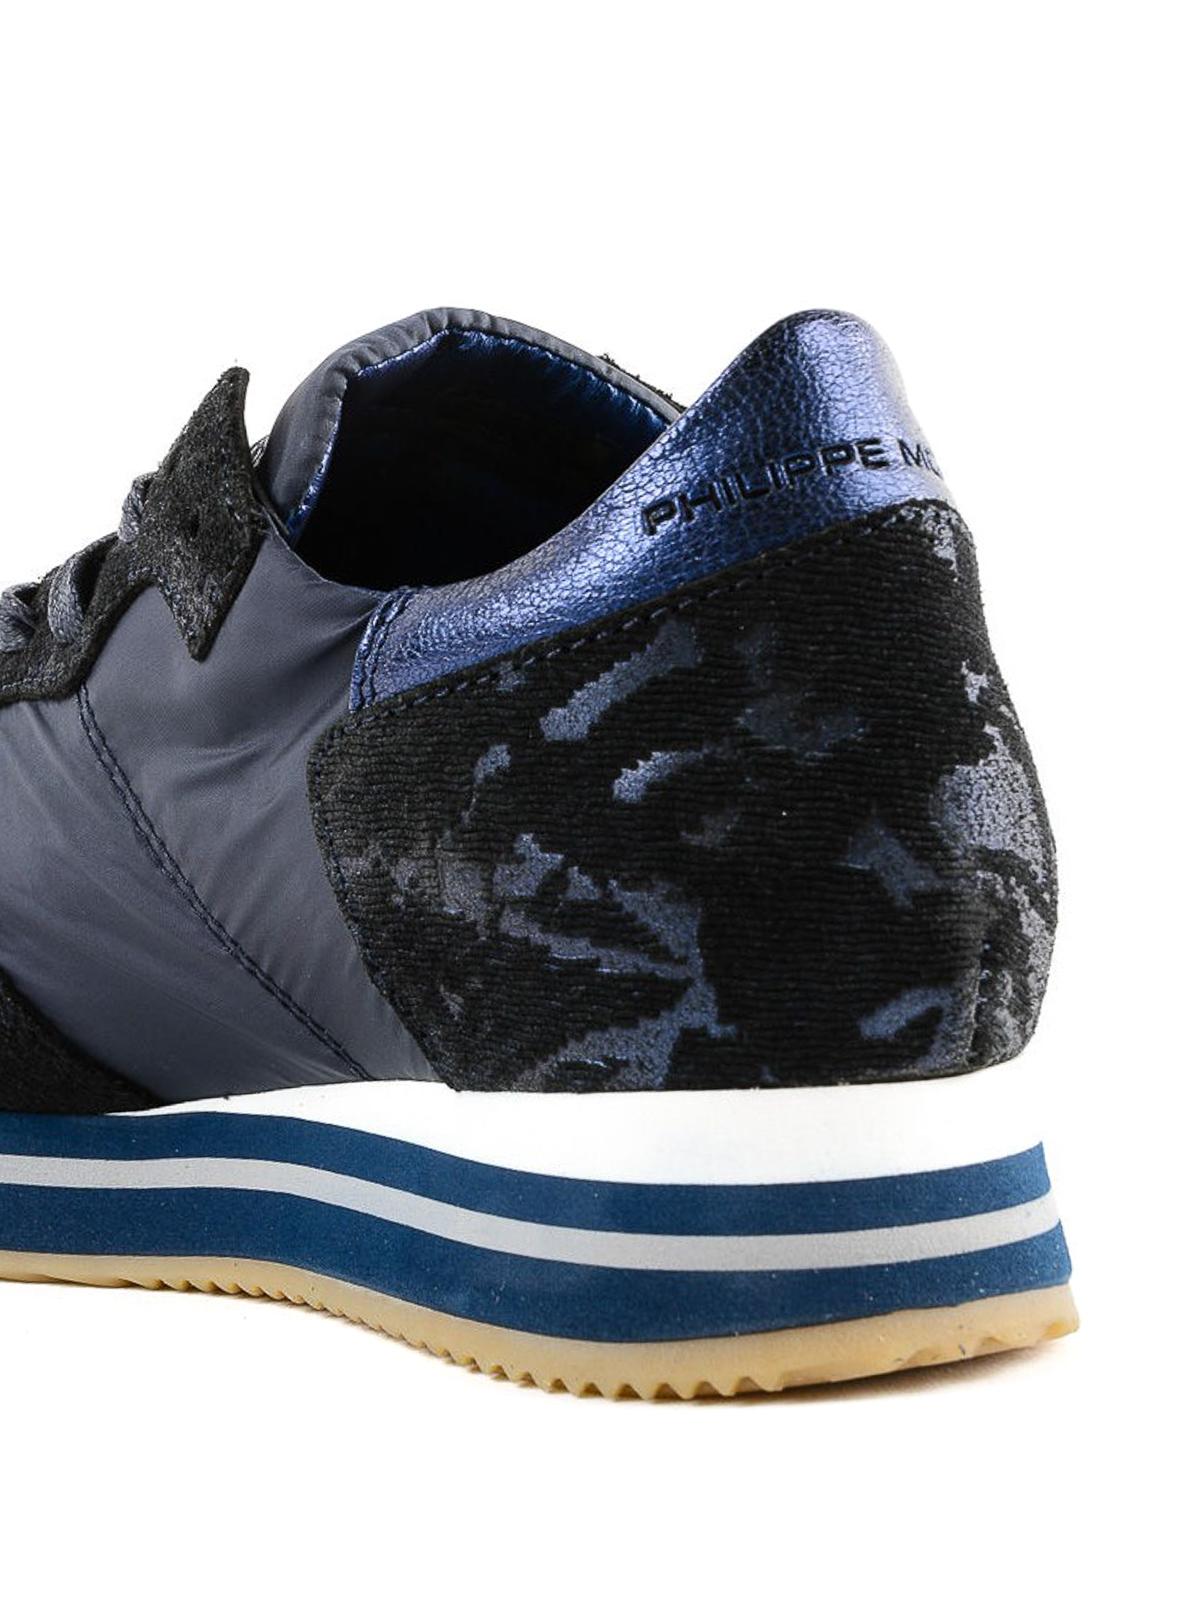 Tropez Higher blue camo sneakers